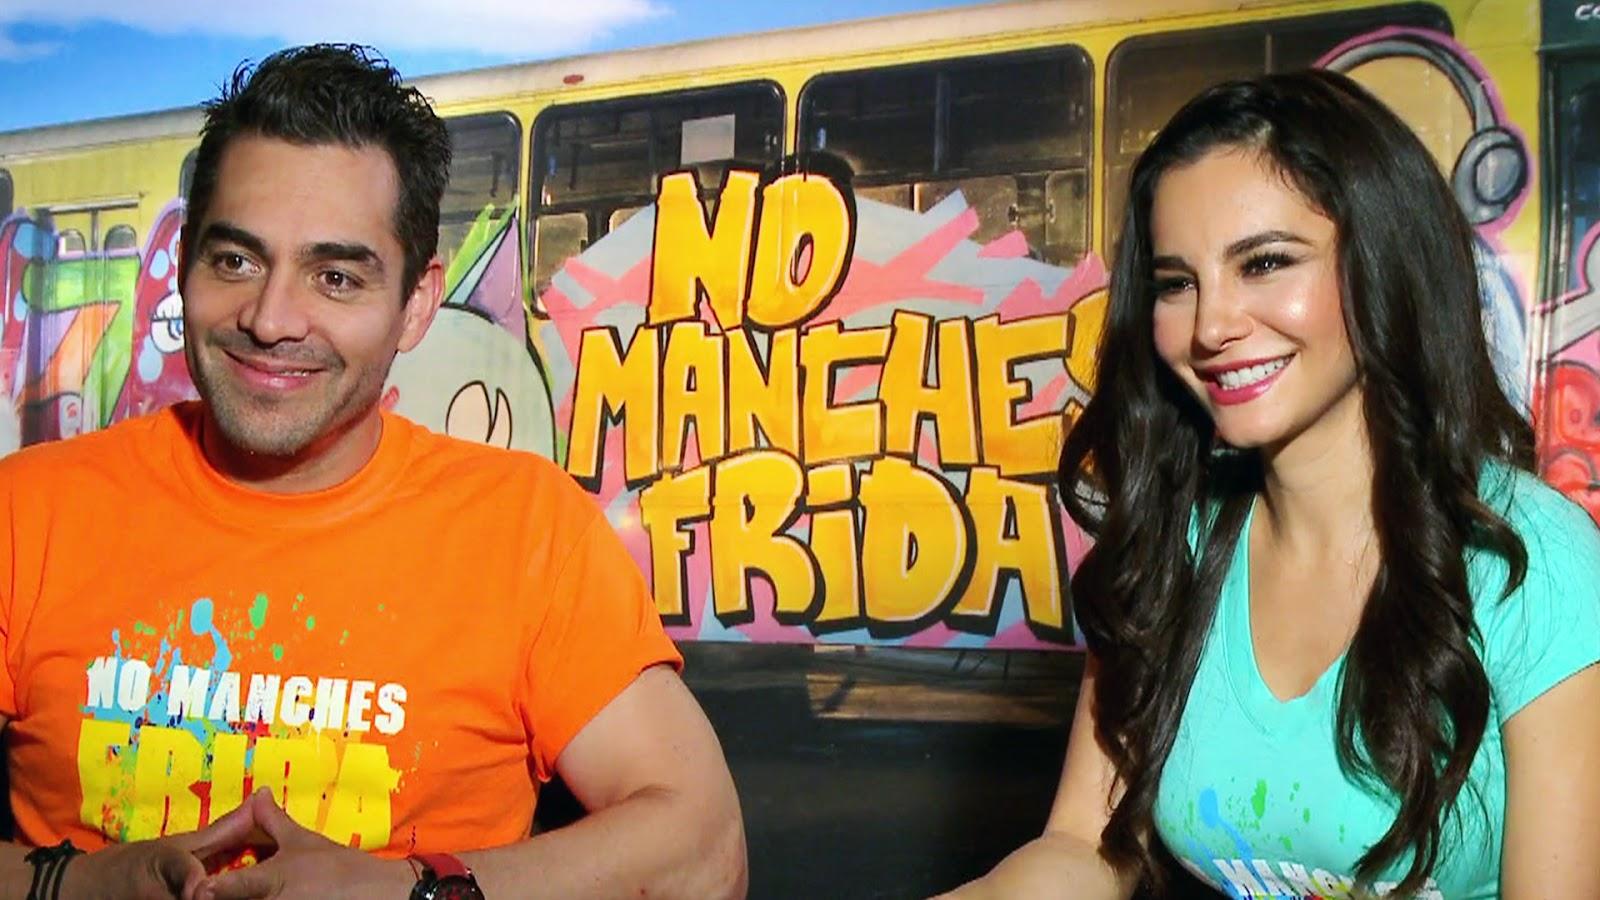 Ensayo: No manches Frida